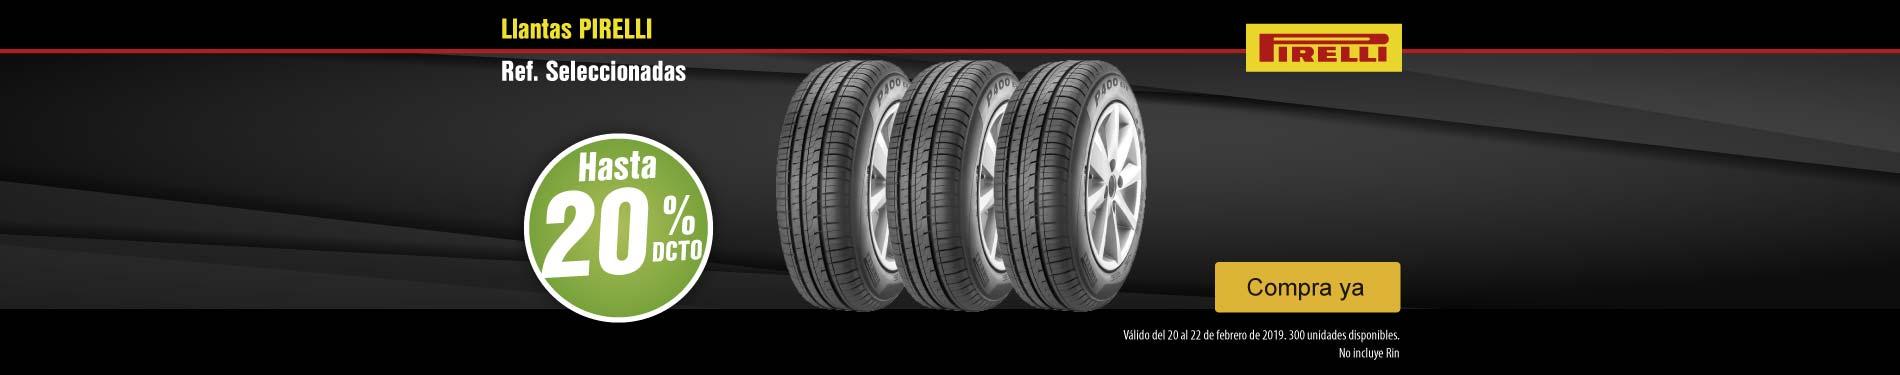 AK-PPAL-3-llantas-PP-Pirelli-20dcto-Feb20-D